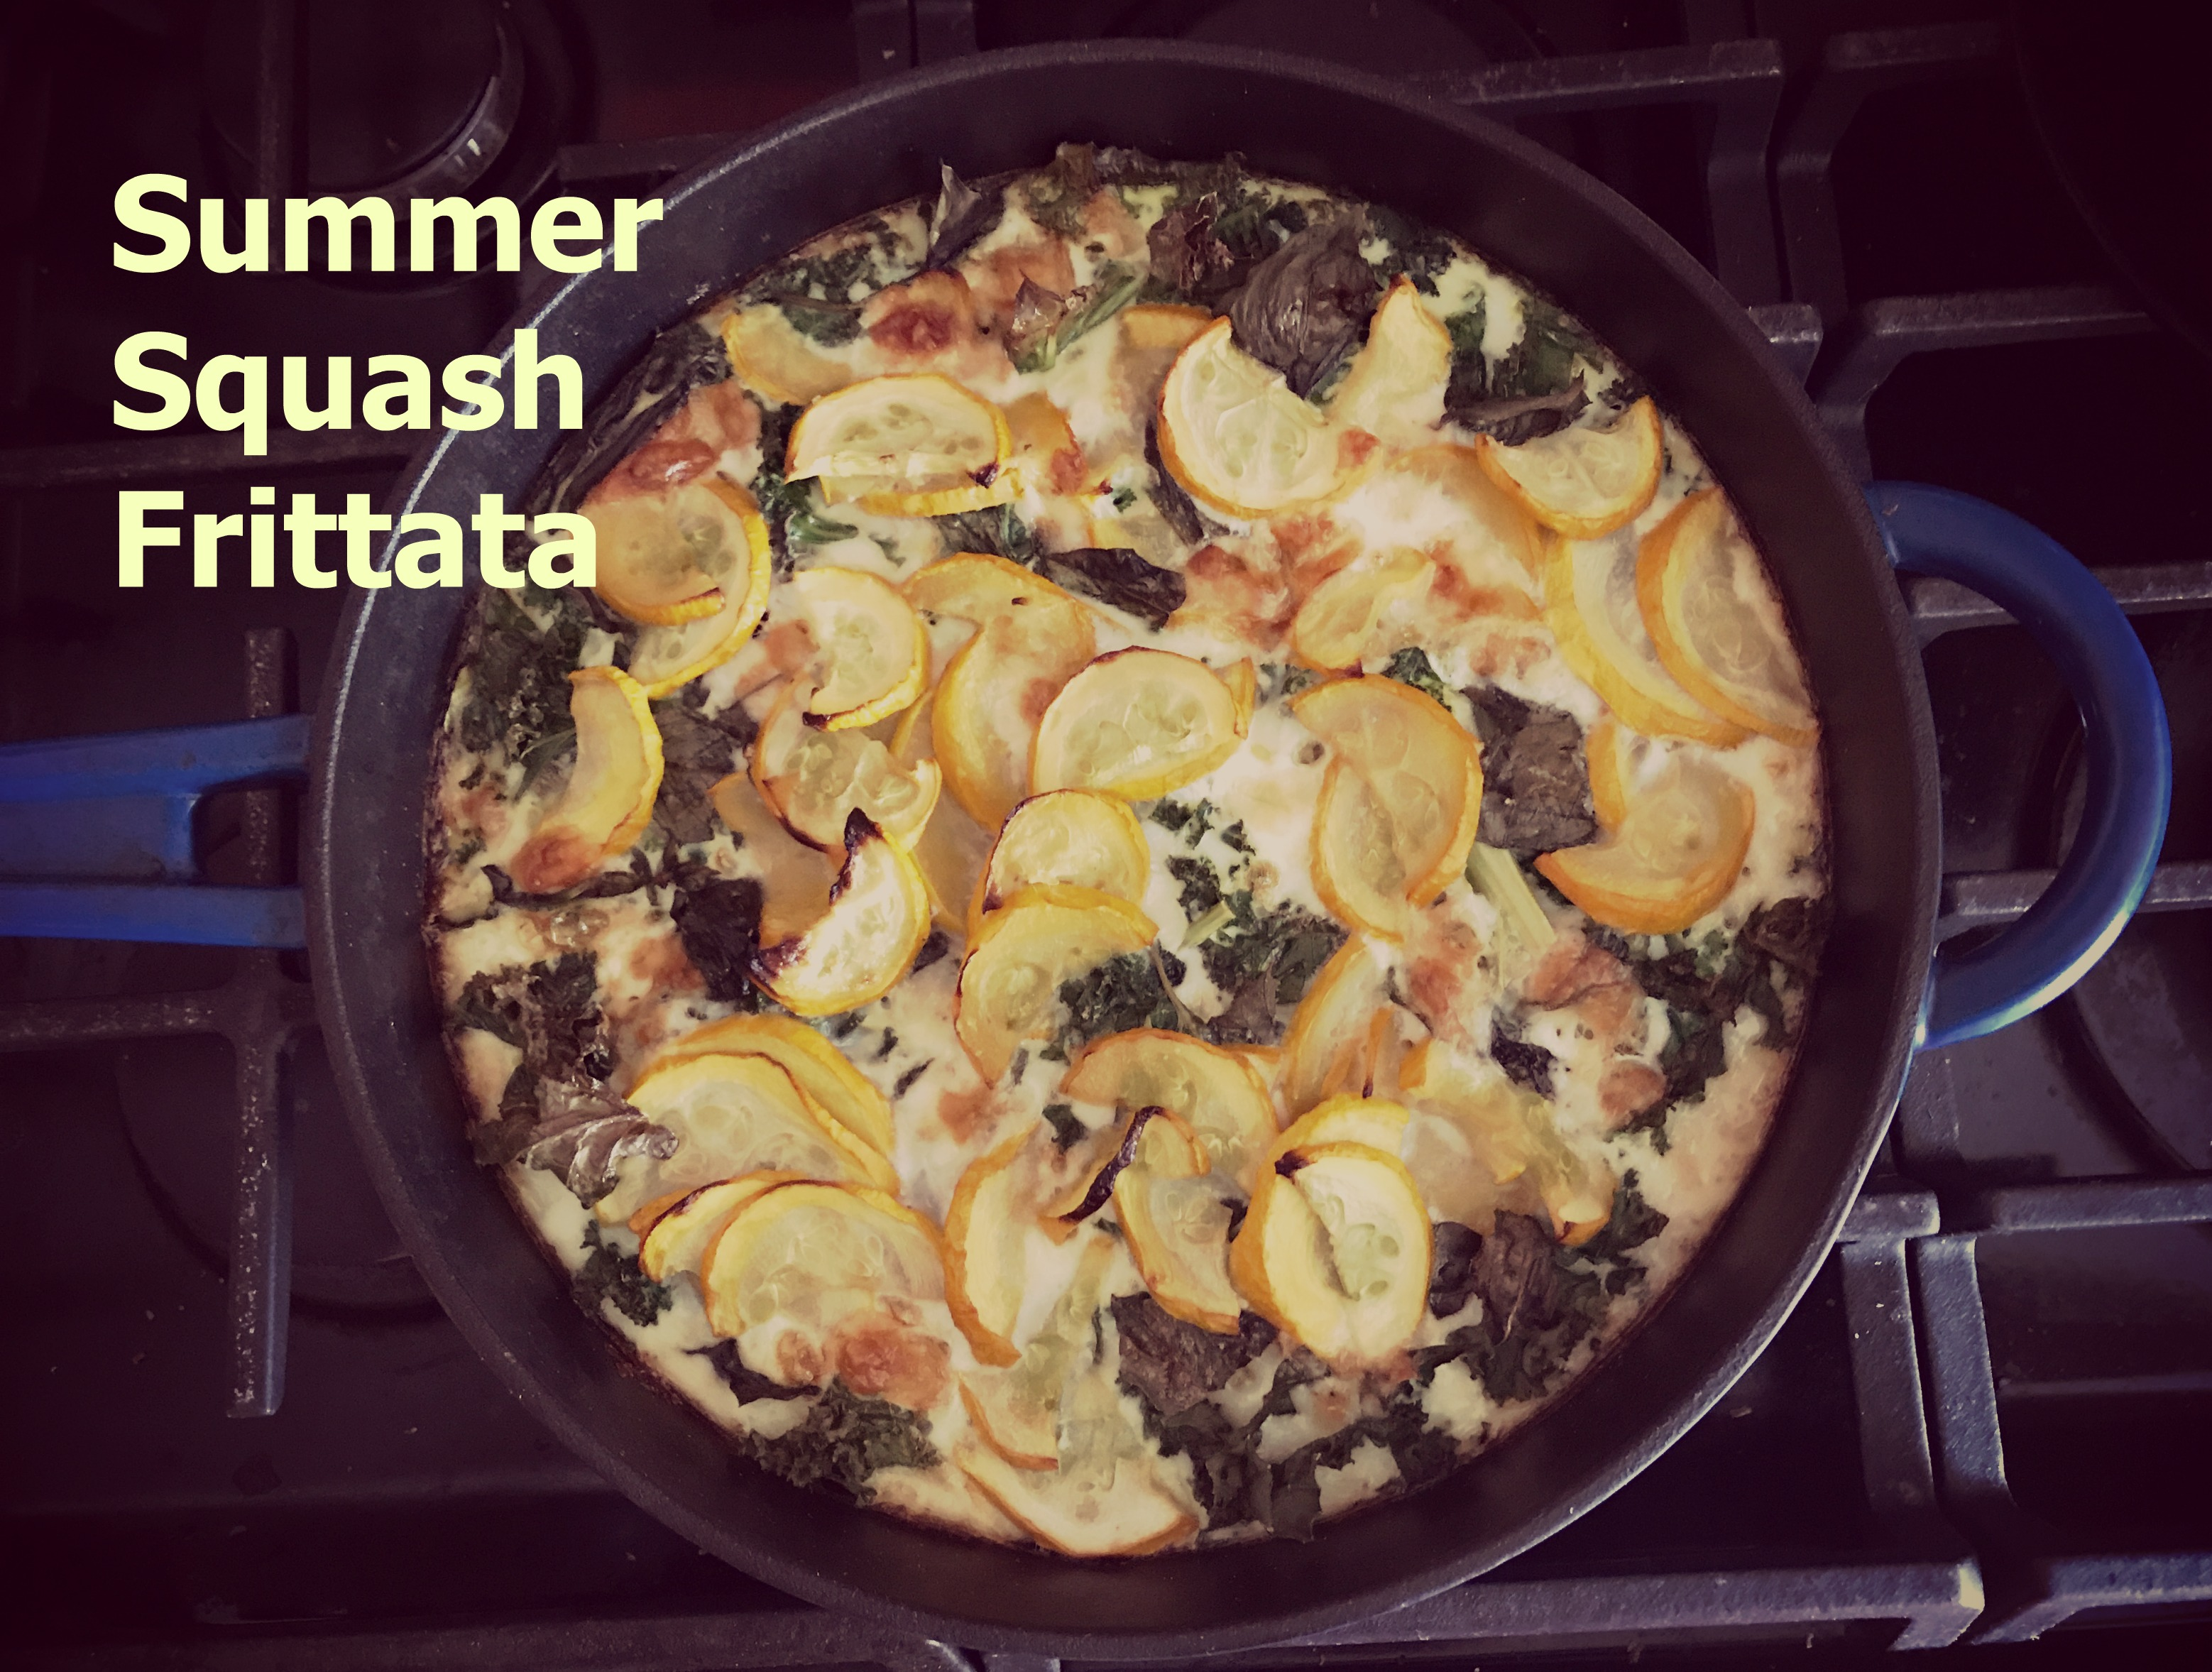 Summer Squash Frittata